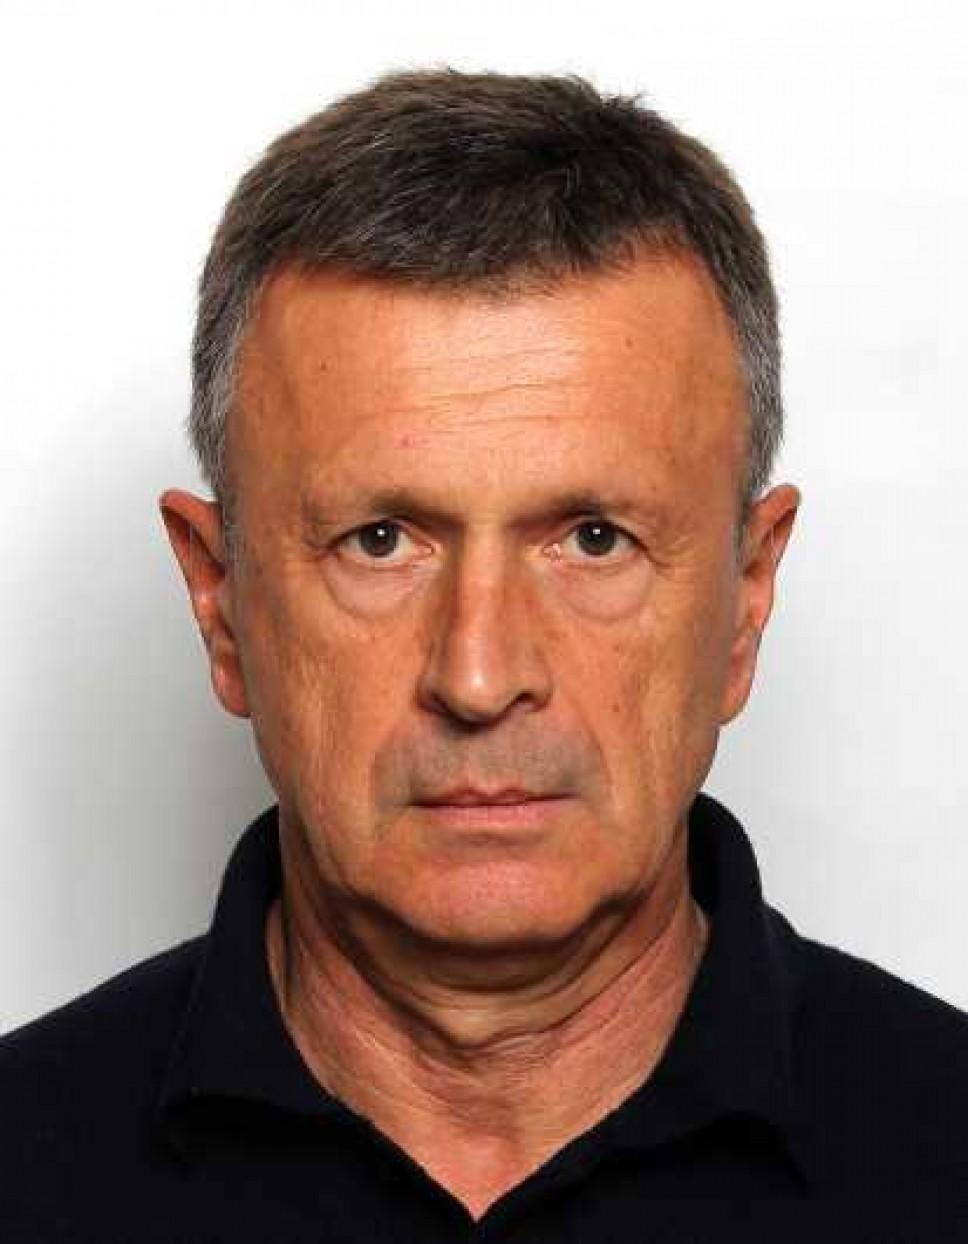 Biografija - Tomović Sreten